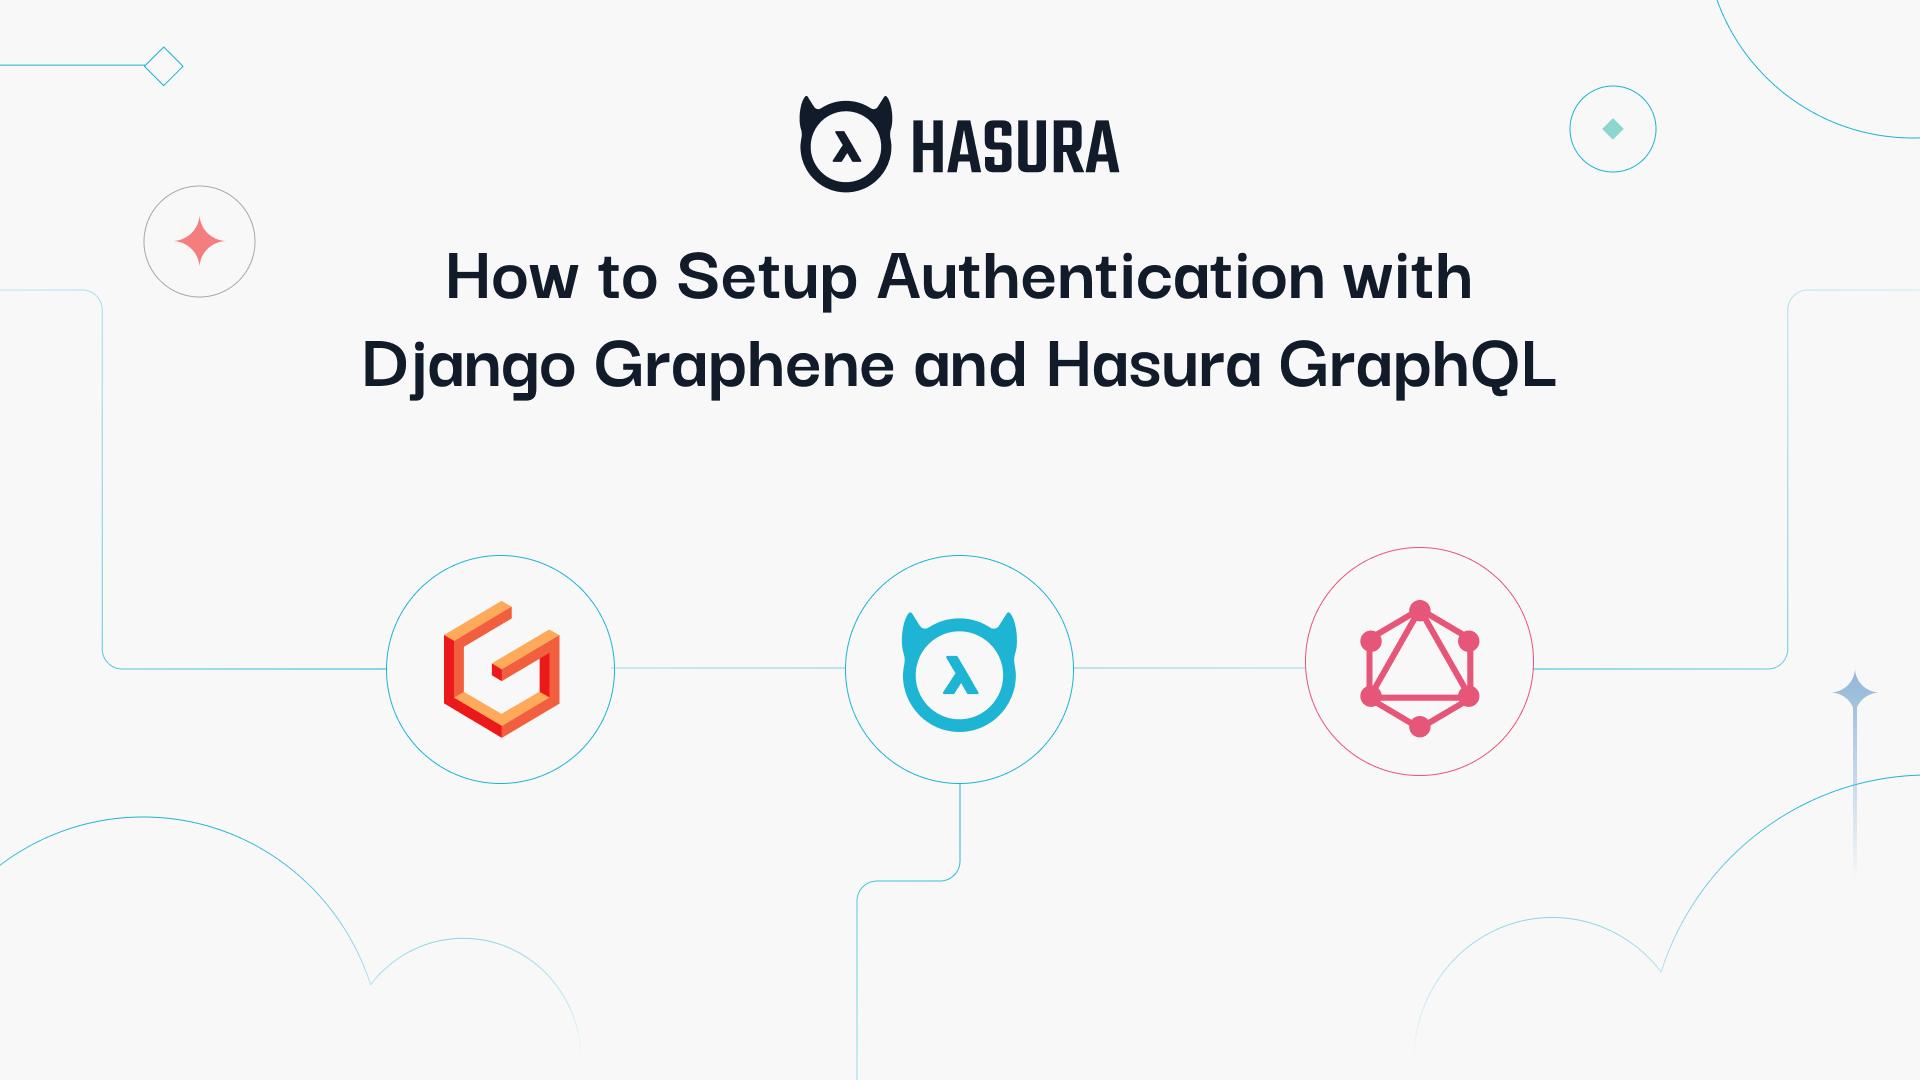 How to Setup Authentication with Django Graphene and Hasura GraphQL